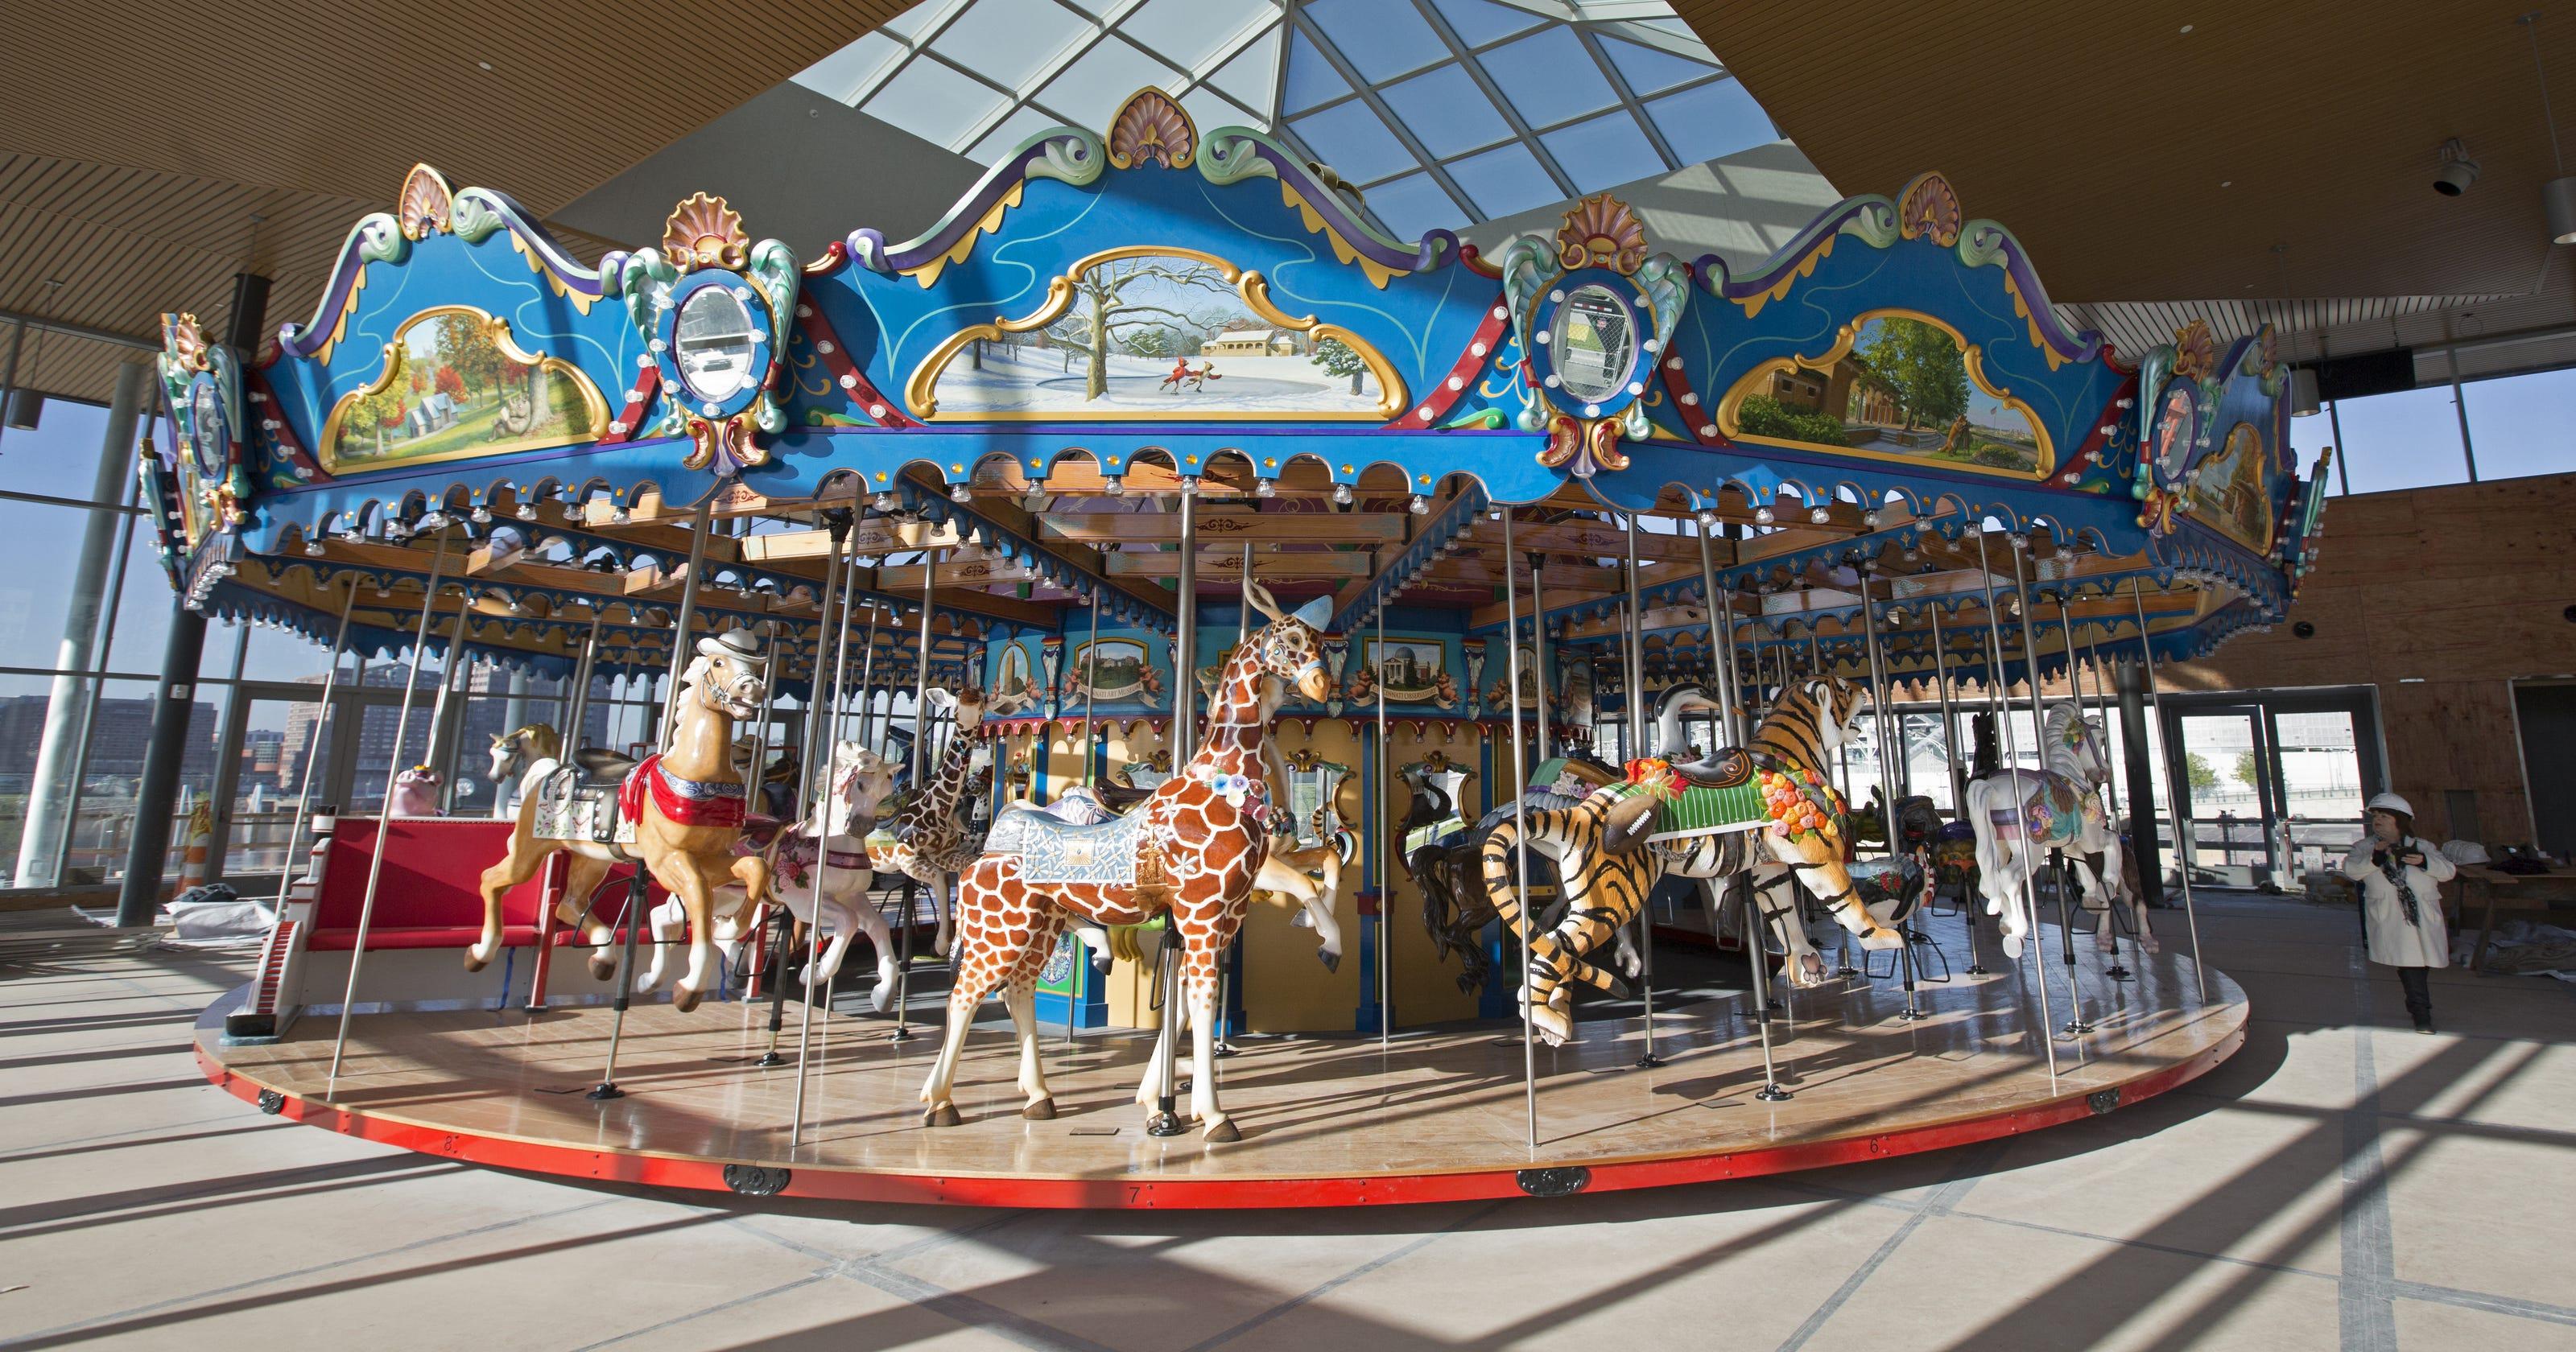 The carousel: A look inside the jewel box